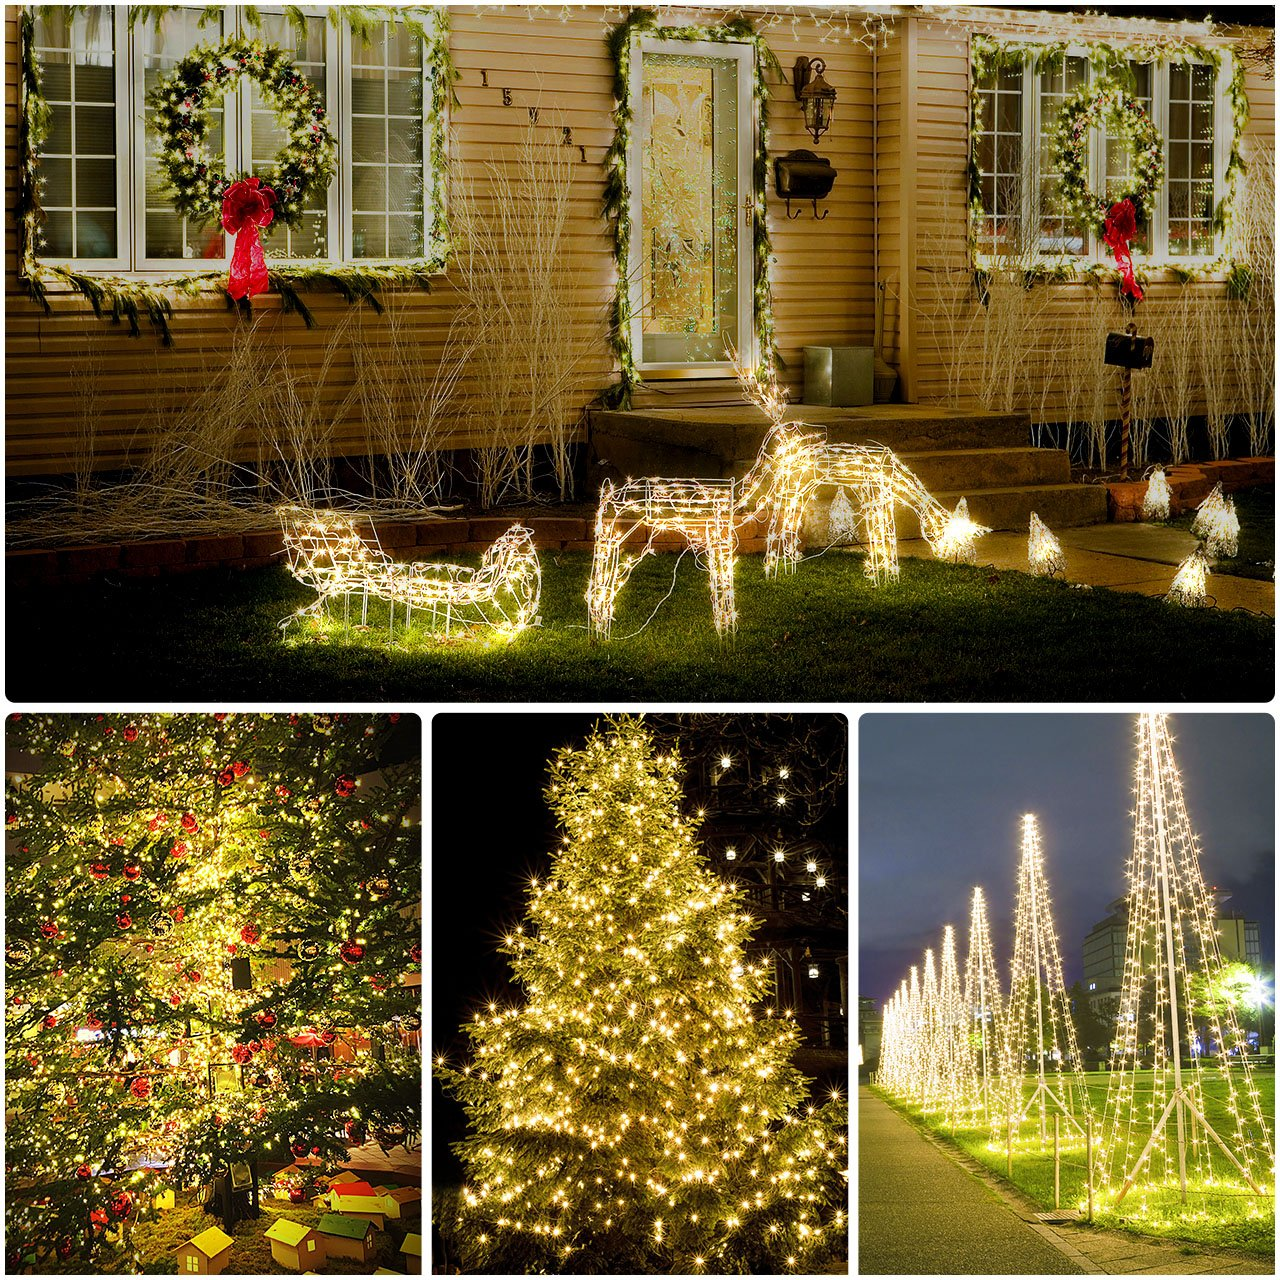 72ft 200 LED Solar String Lights Outdoor Waterproof Light Fairy Lights for Patio Garden Yard Party Wedding Backyard Decor in Lighting Strings from Lights Lighting